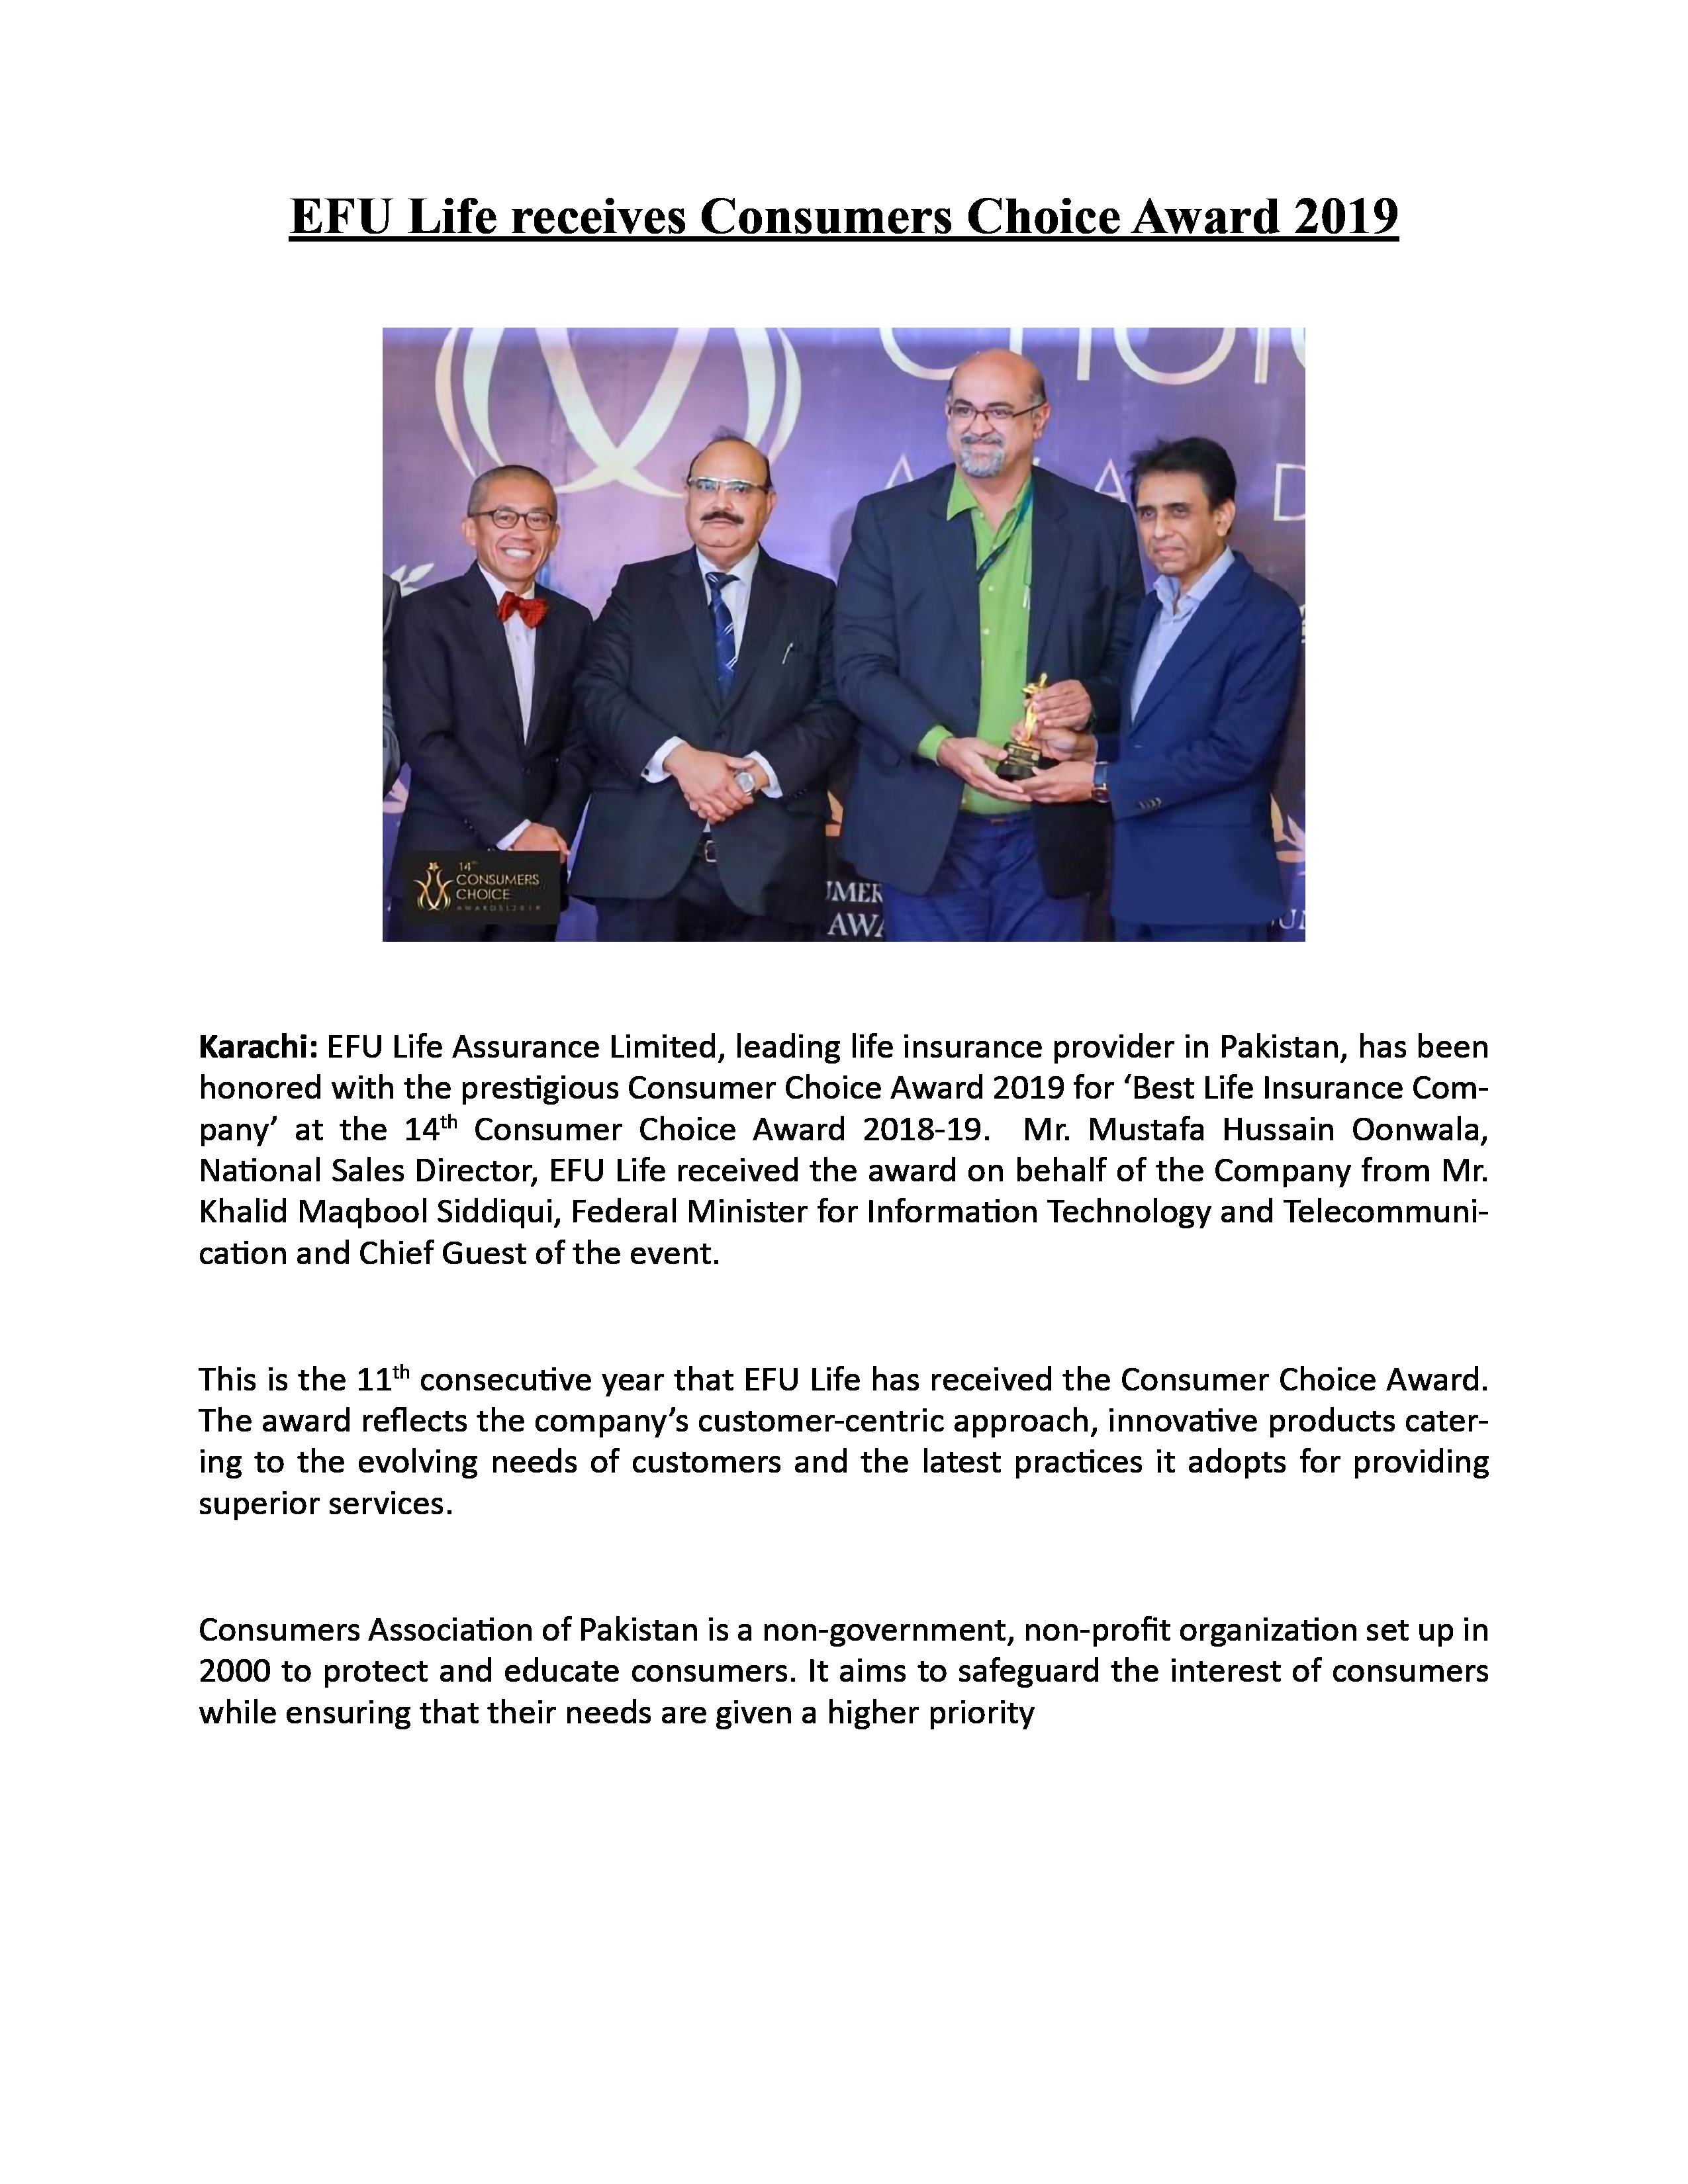 EFU Life receives Consumers Choice Award 2019